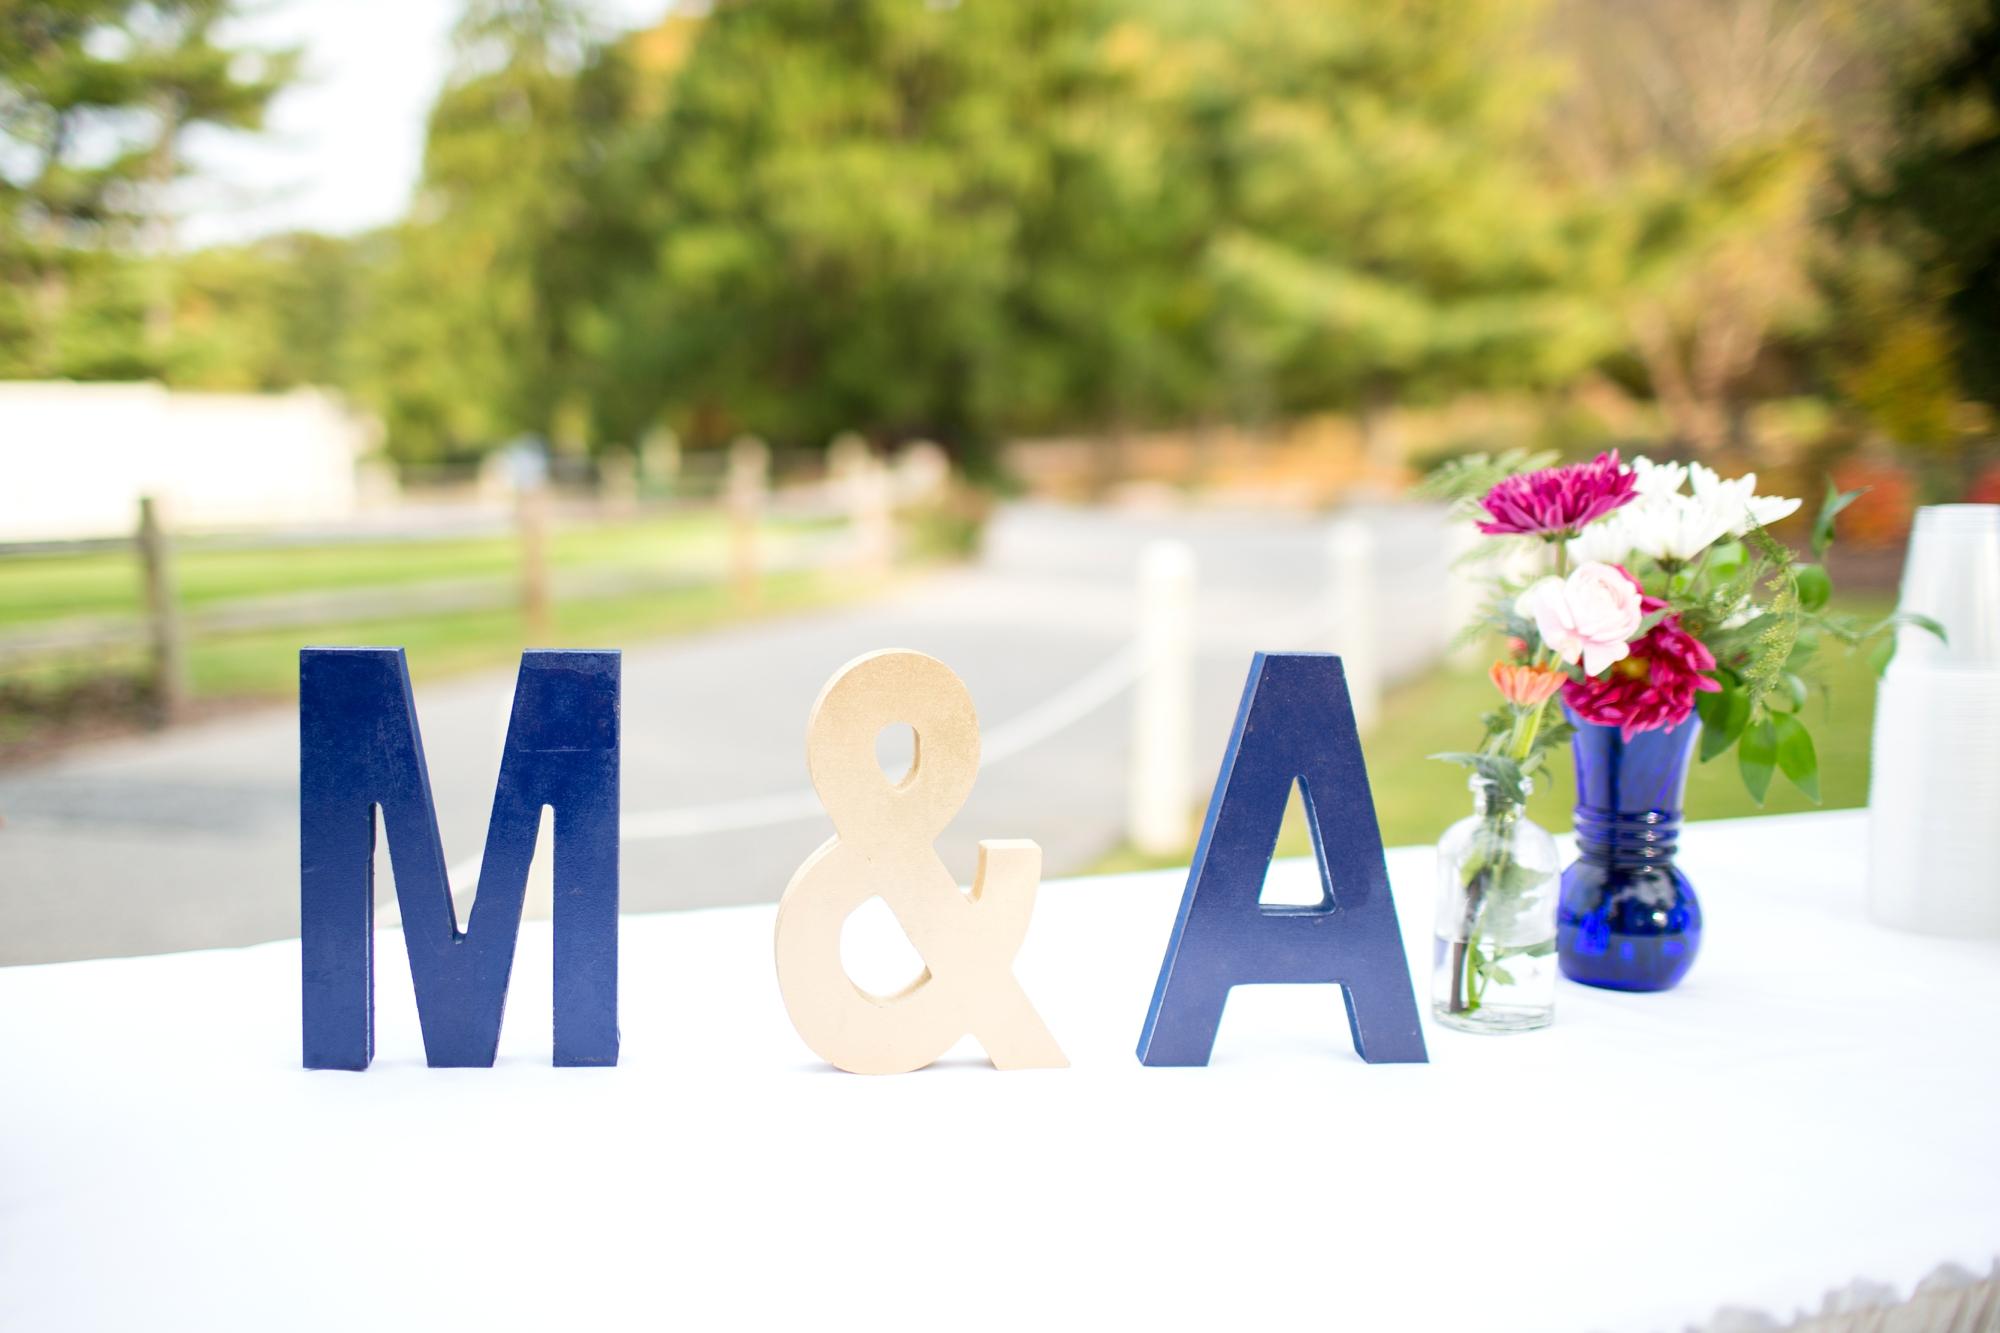 5-Finkel Wedding Ceremony-539_anna grace photography maryland wedding photographer turf valley.jpg